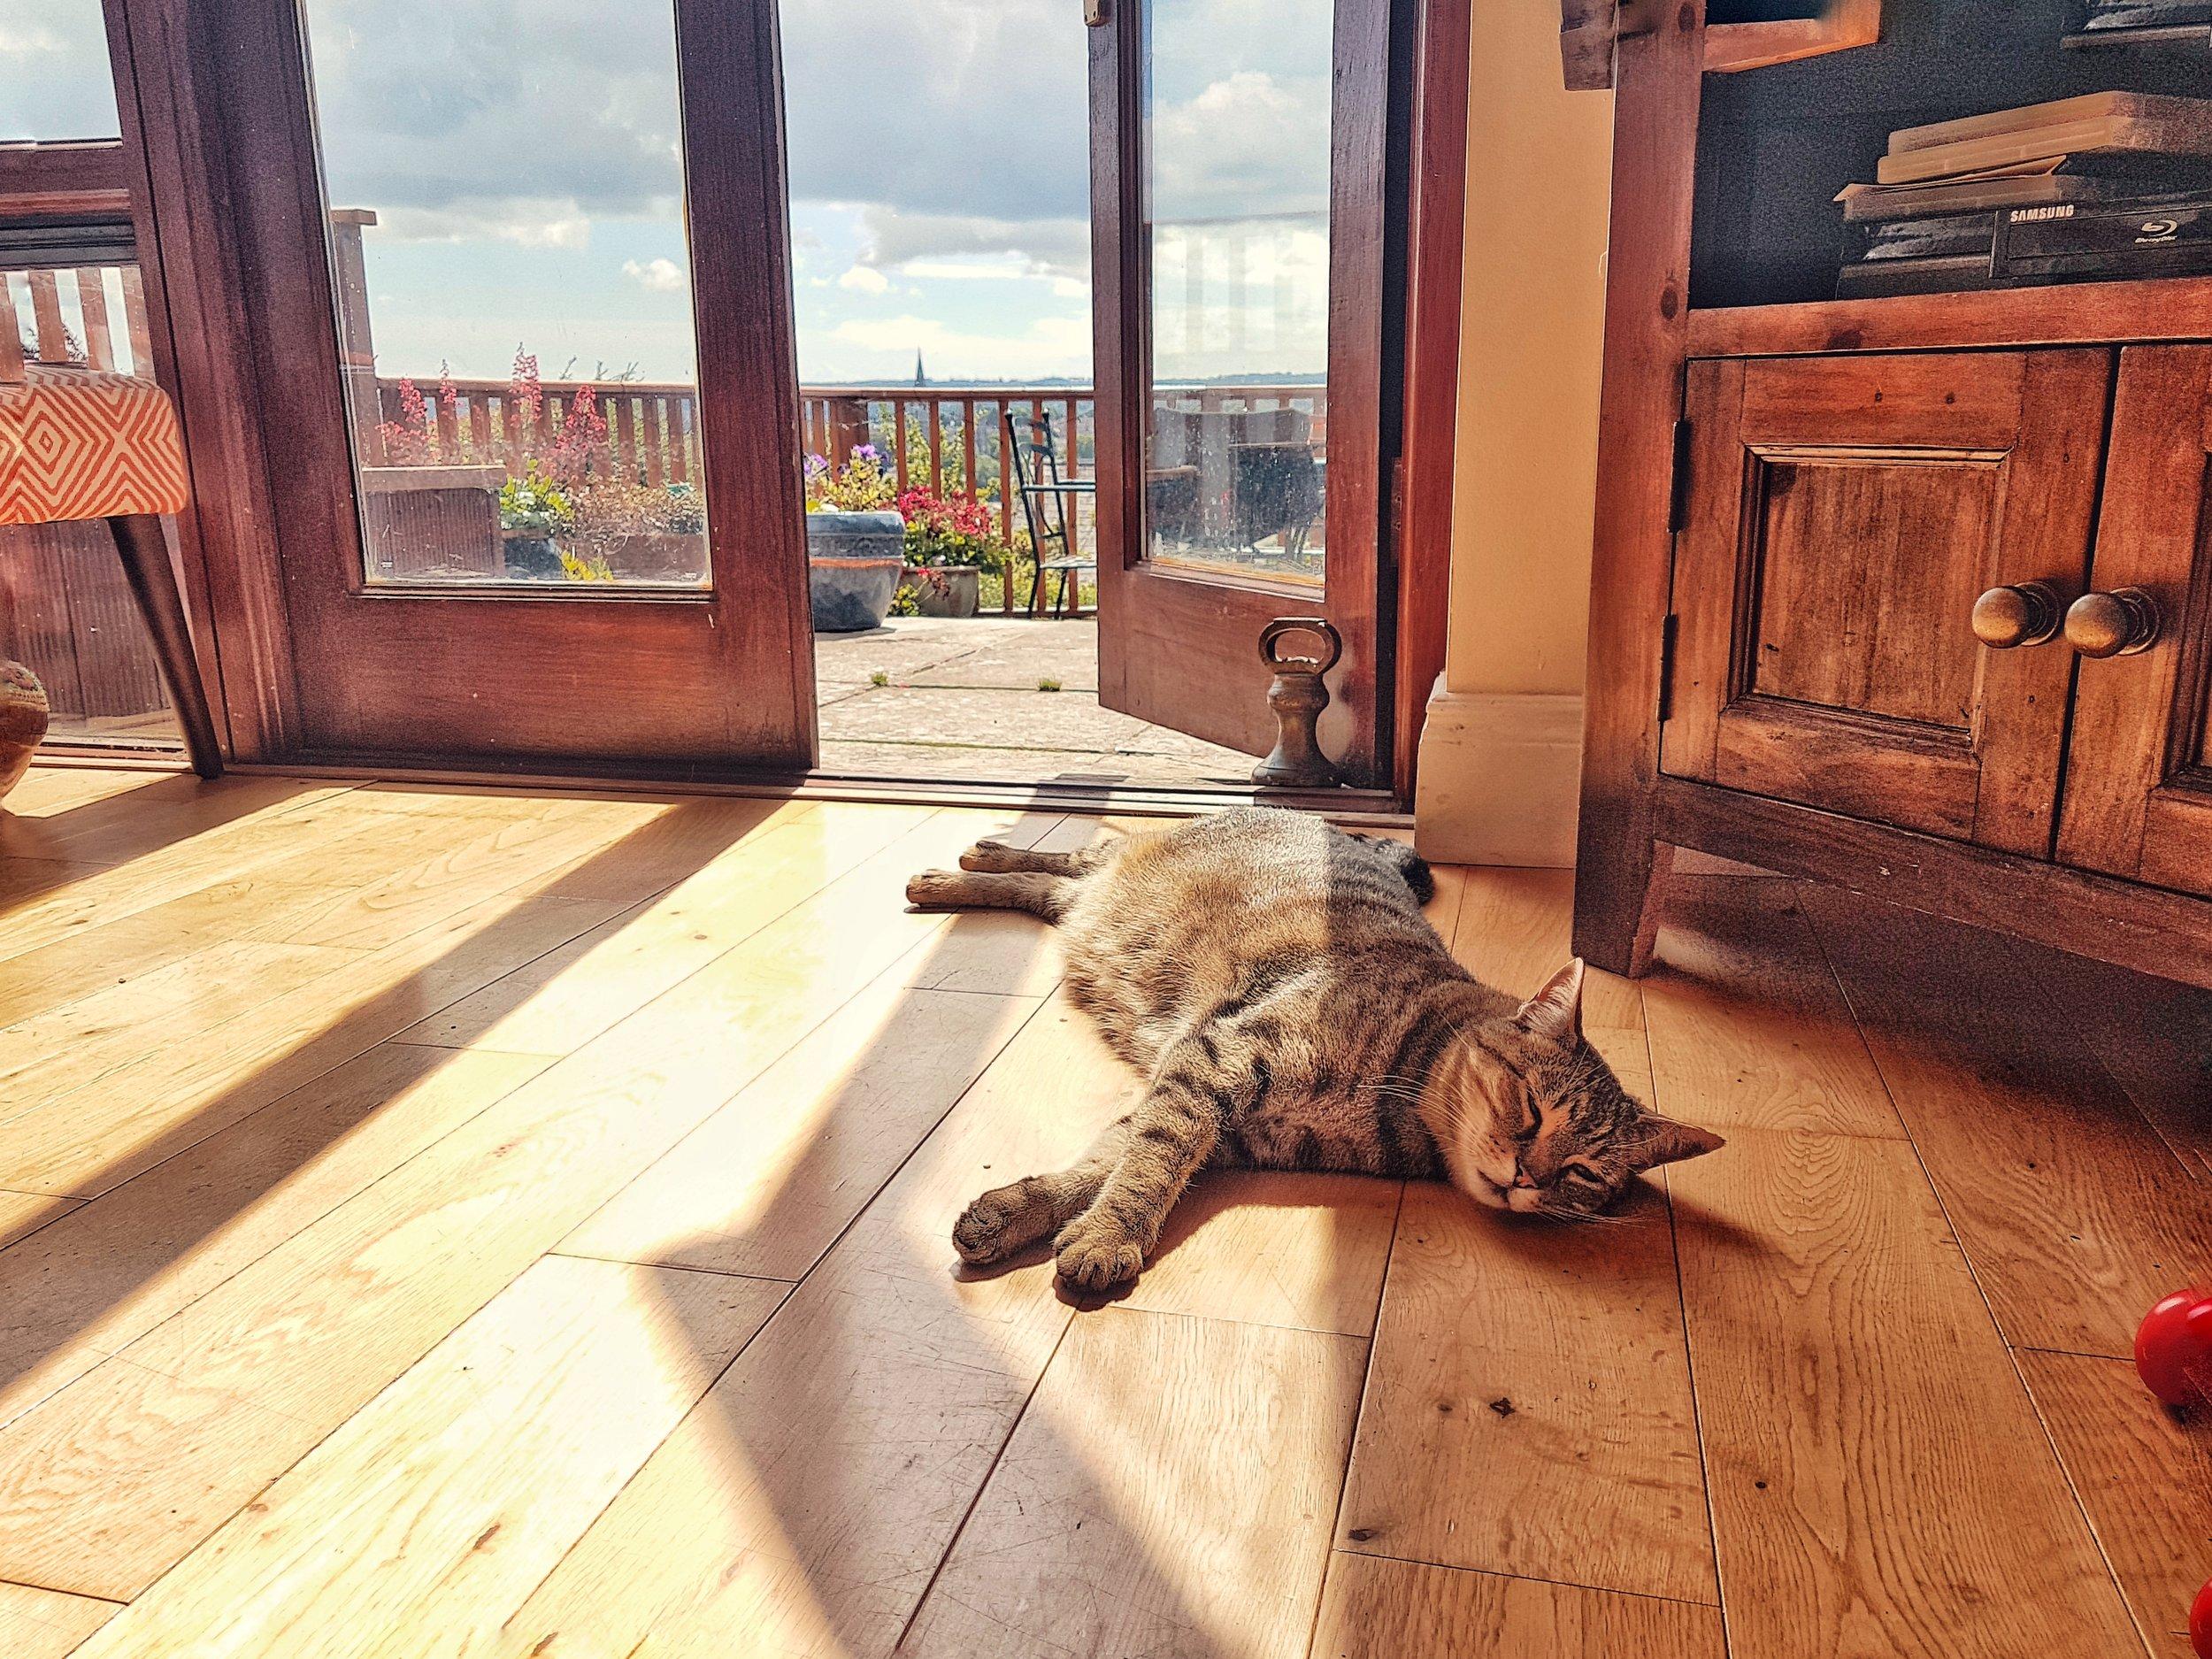 county cork. cork. ireland. irish. history. city. house sitting. old. travel. travel photography. travel photographer.  cat bathing in the sunlight.jpg